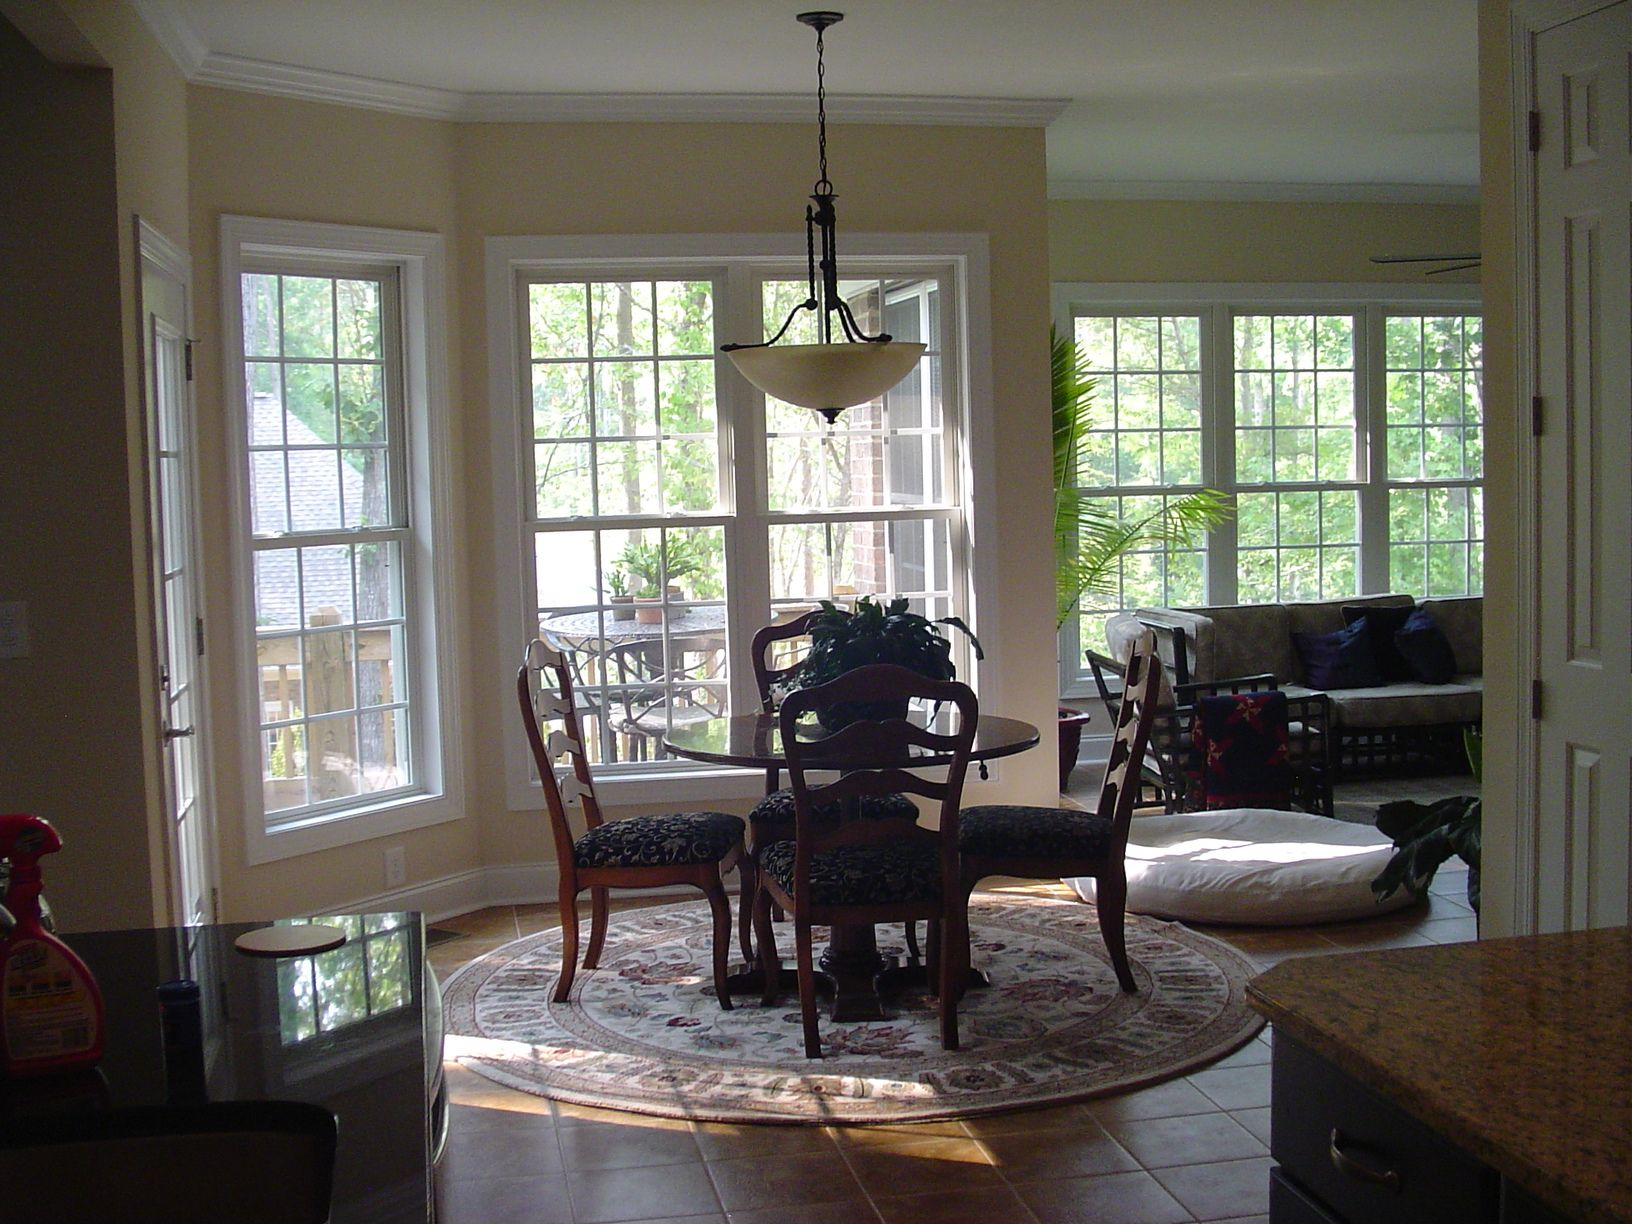 Frank betz ambrose view into breakfast nook and sunroom for Sunroom breakfast nook